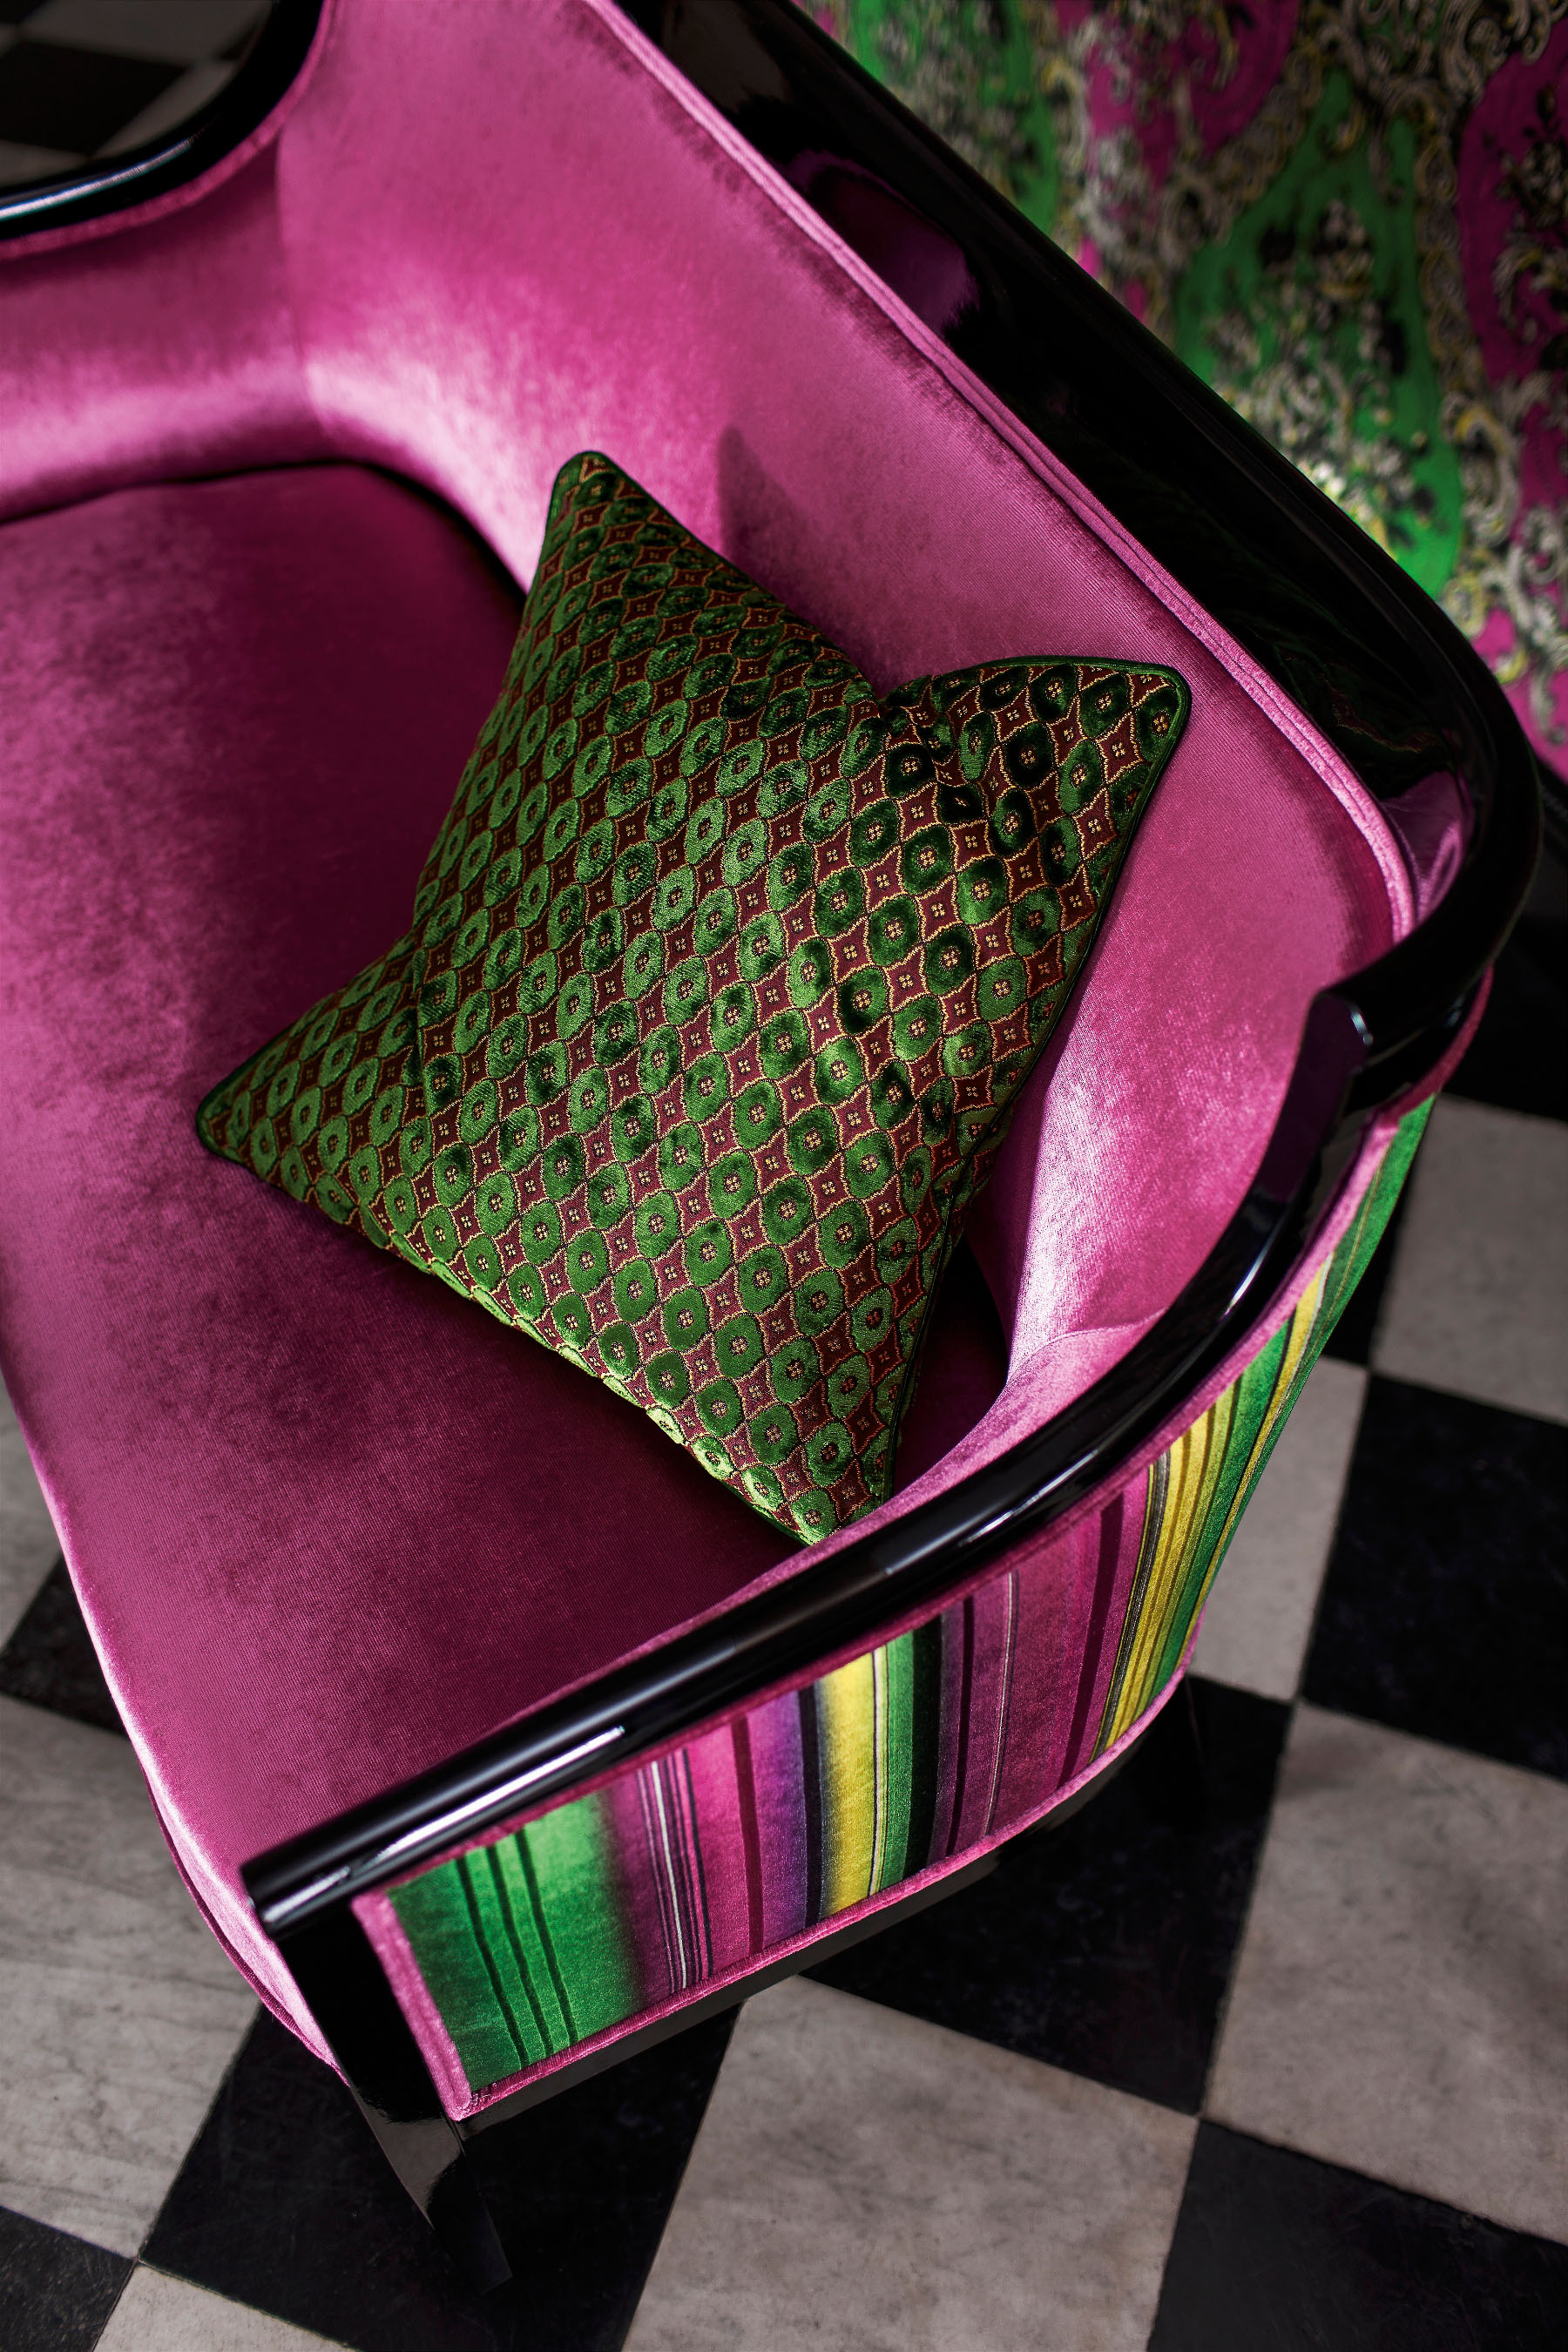 Upholstery fabric brissac 1 4137 030 jab anstoetz - Toile de mayenne rideaux ...